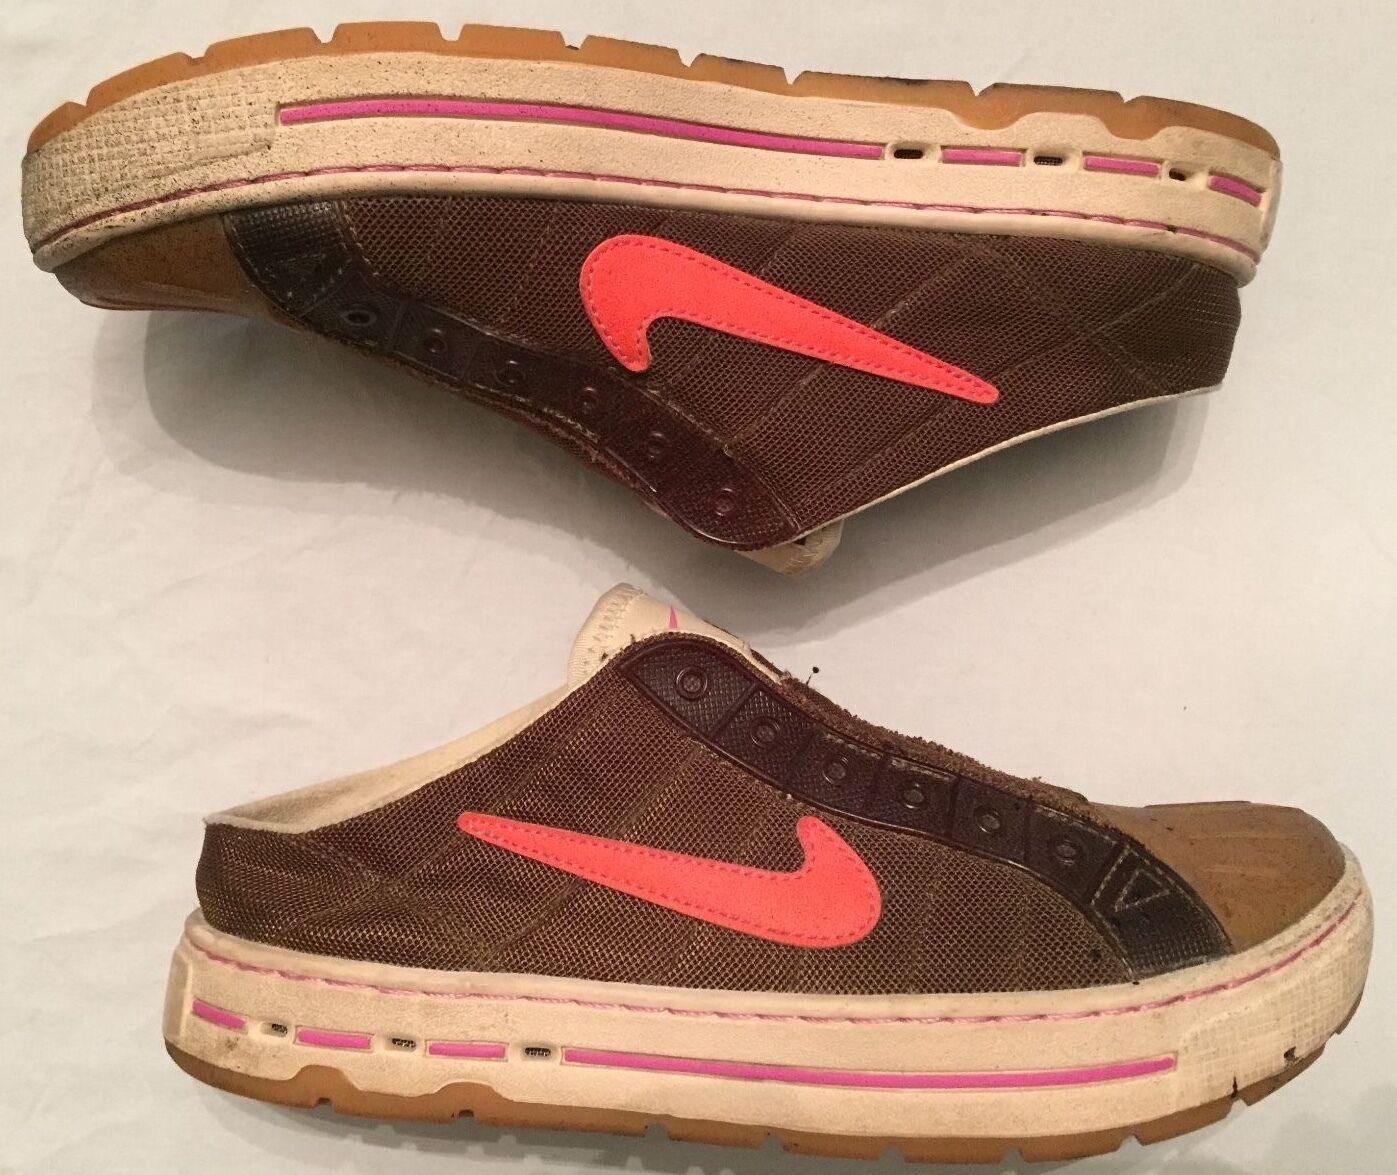 NIKE Shell Top Mule Sneaker Women's 7.5 Low Top Slip-On 315848-381 Brown/Orange Casual wild